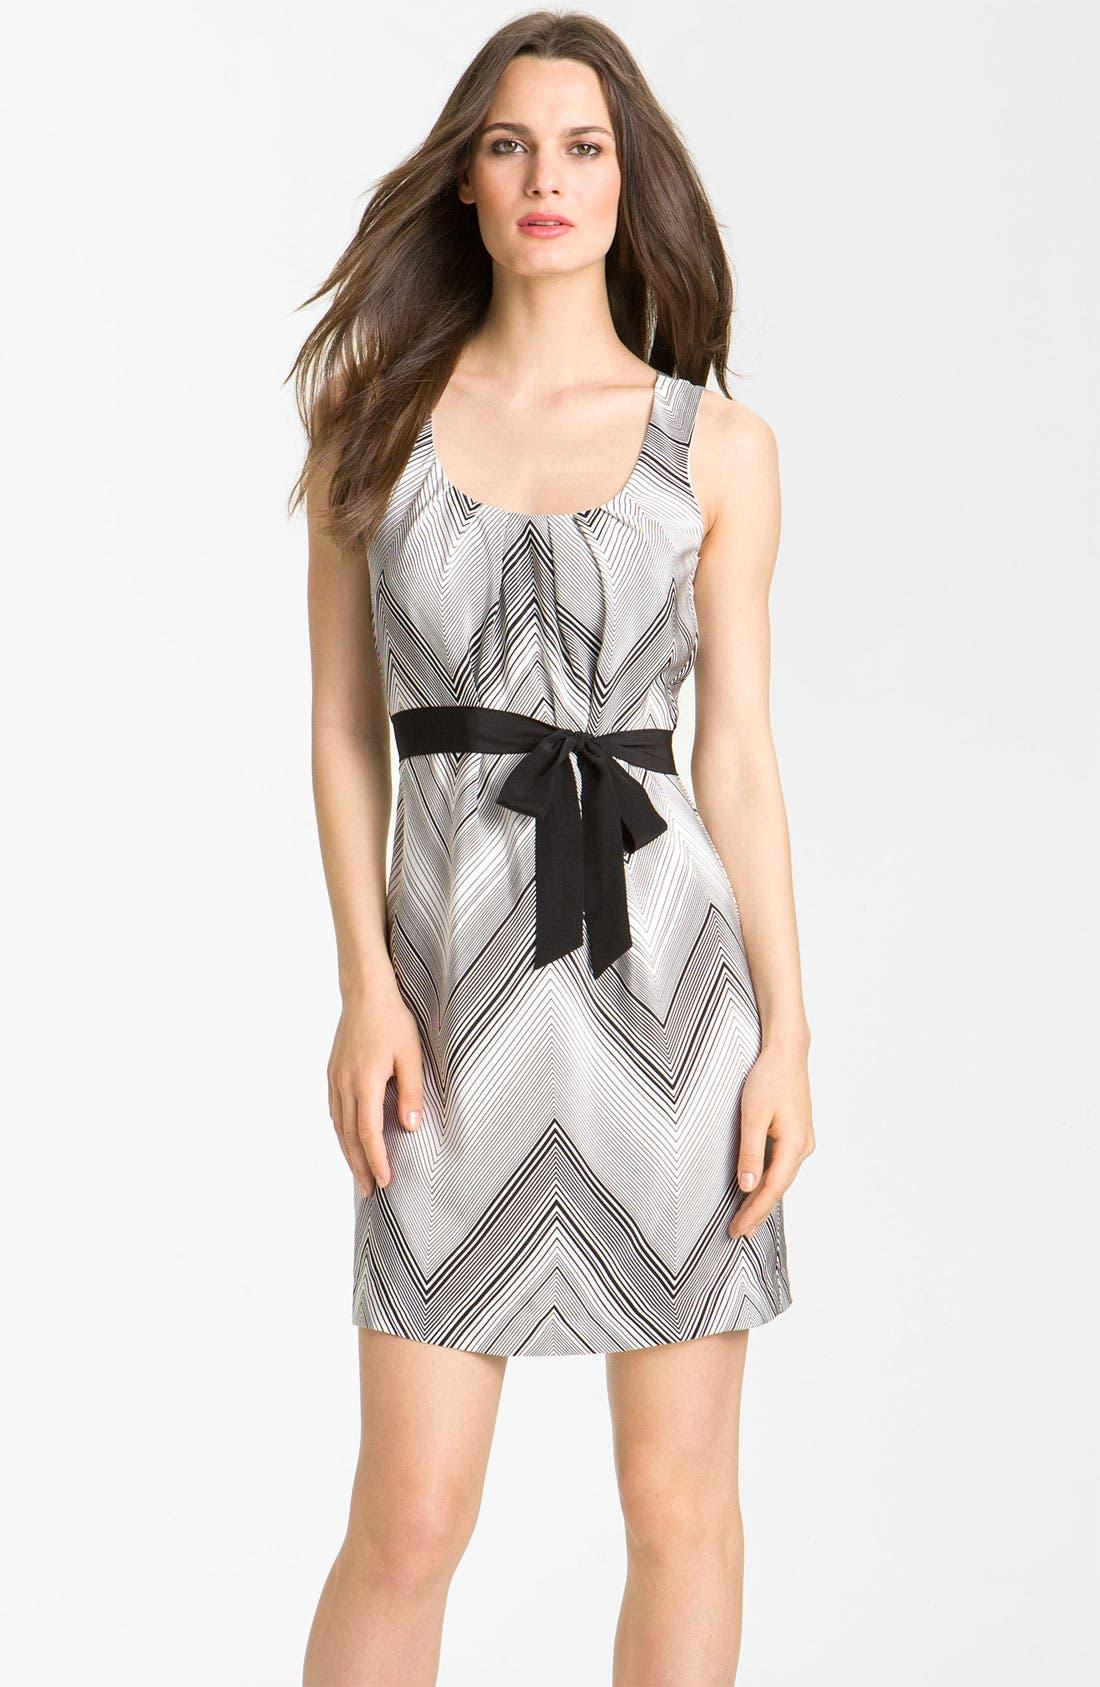 Main Image - Trina Turk 'Thistle' Sleeveless Dress